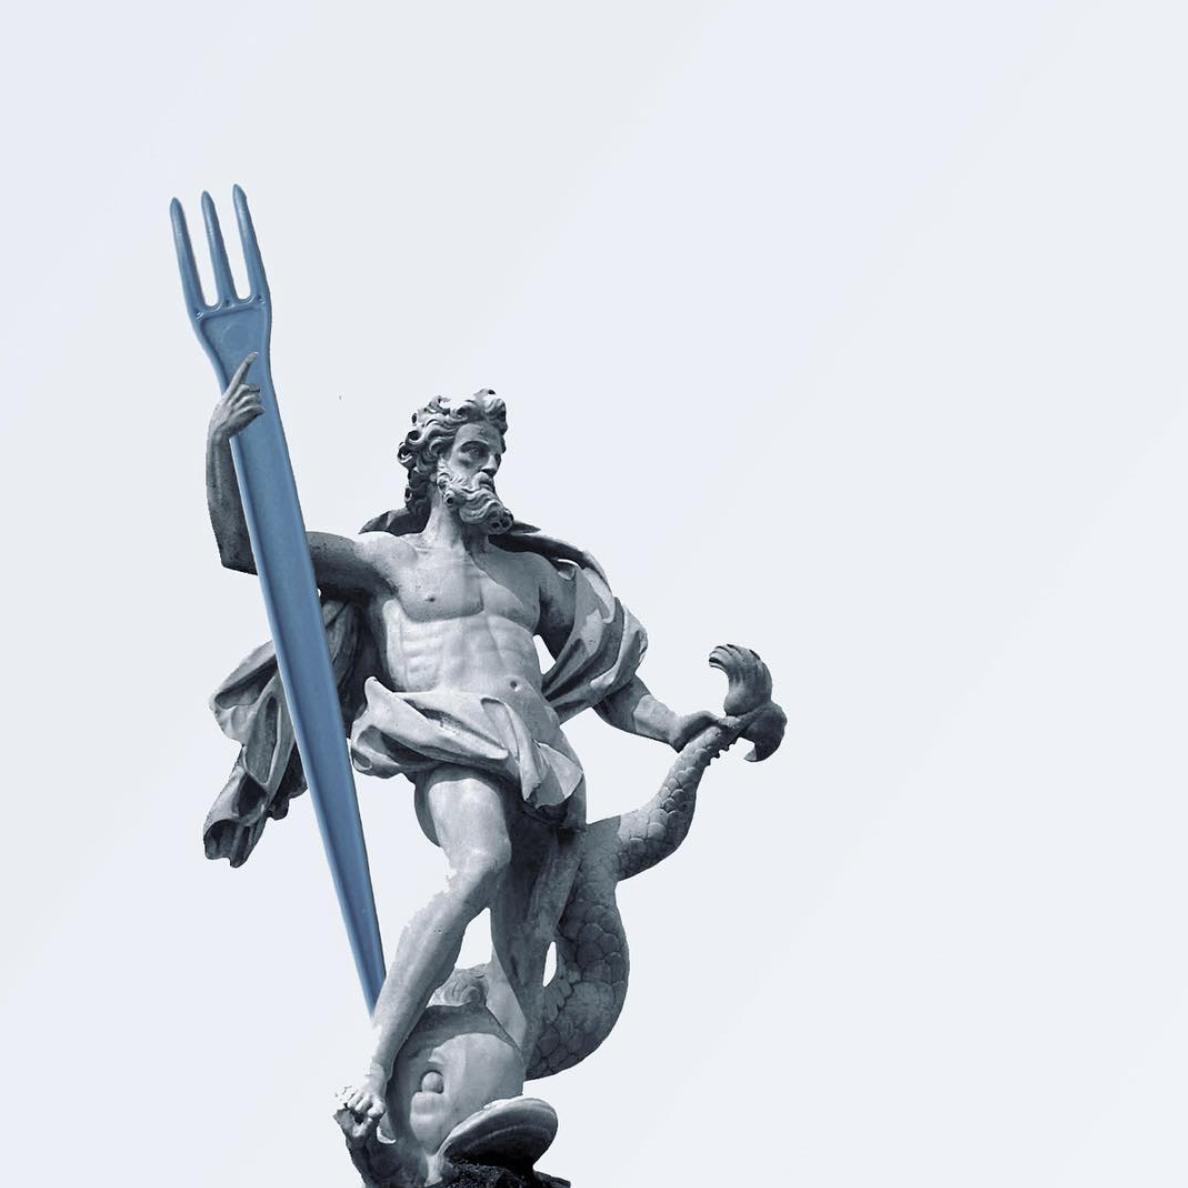 Poseidon doesn't like plastic